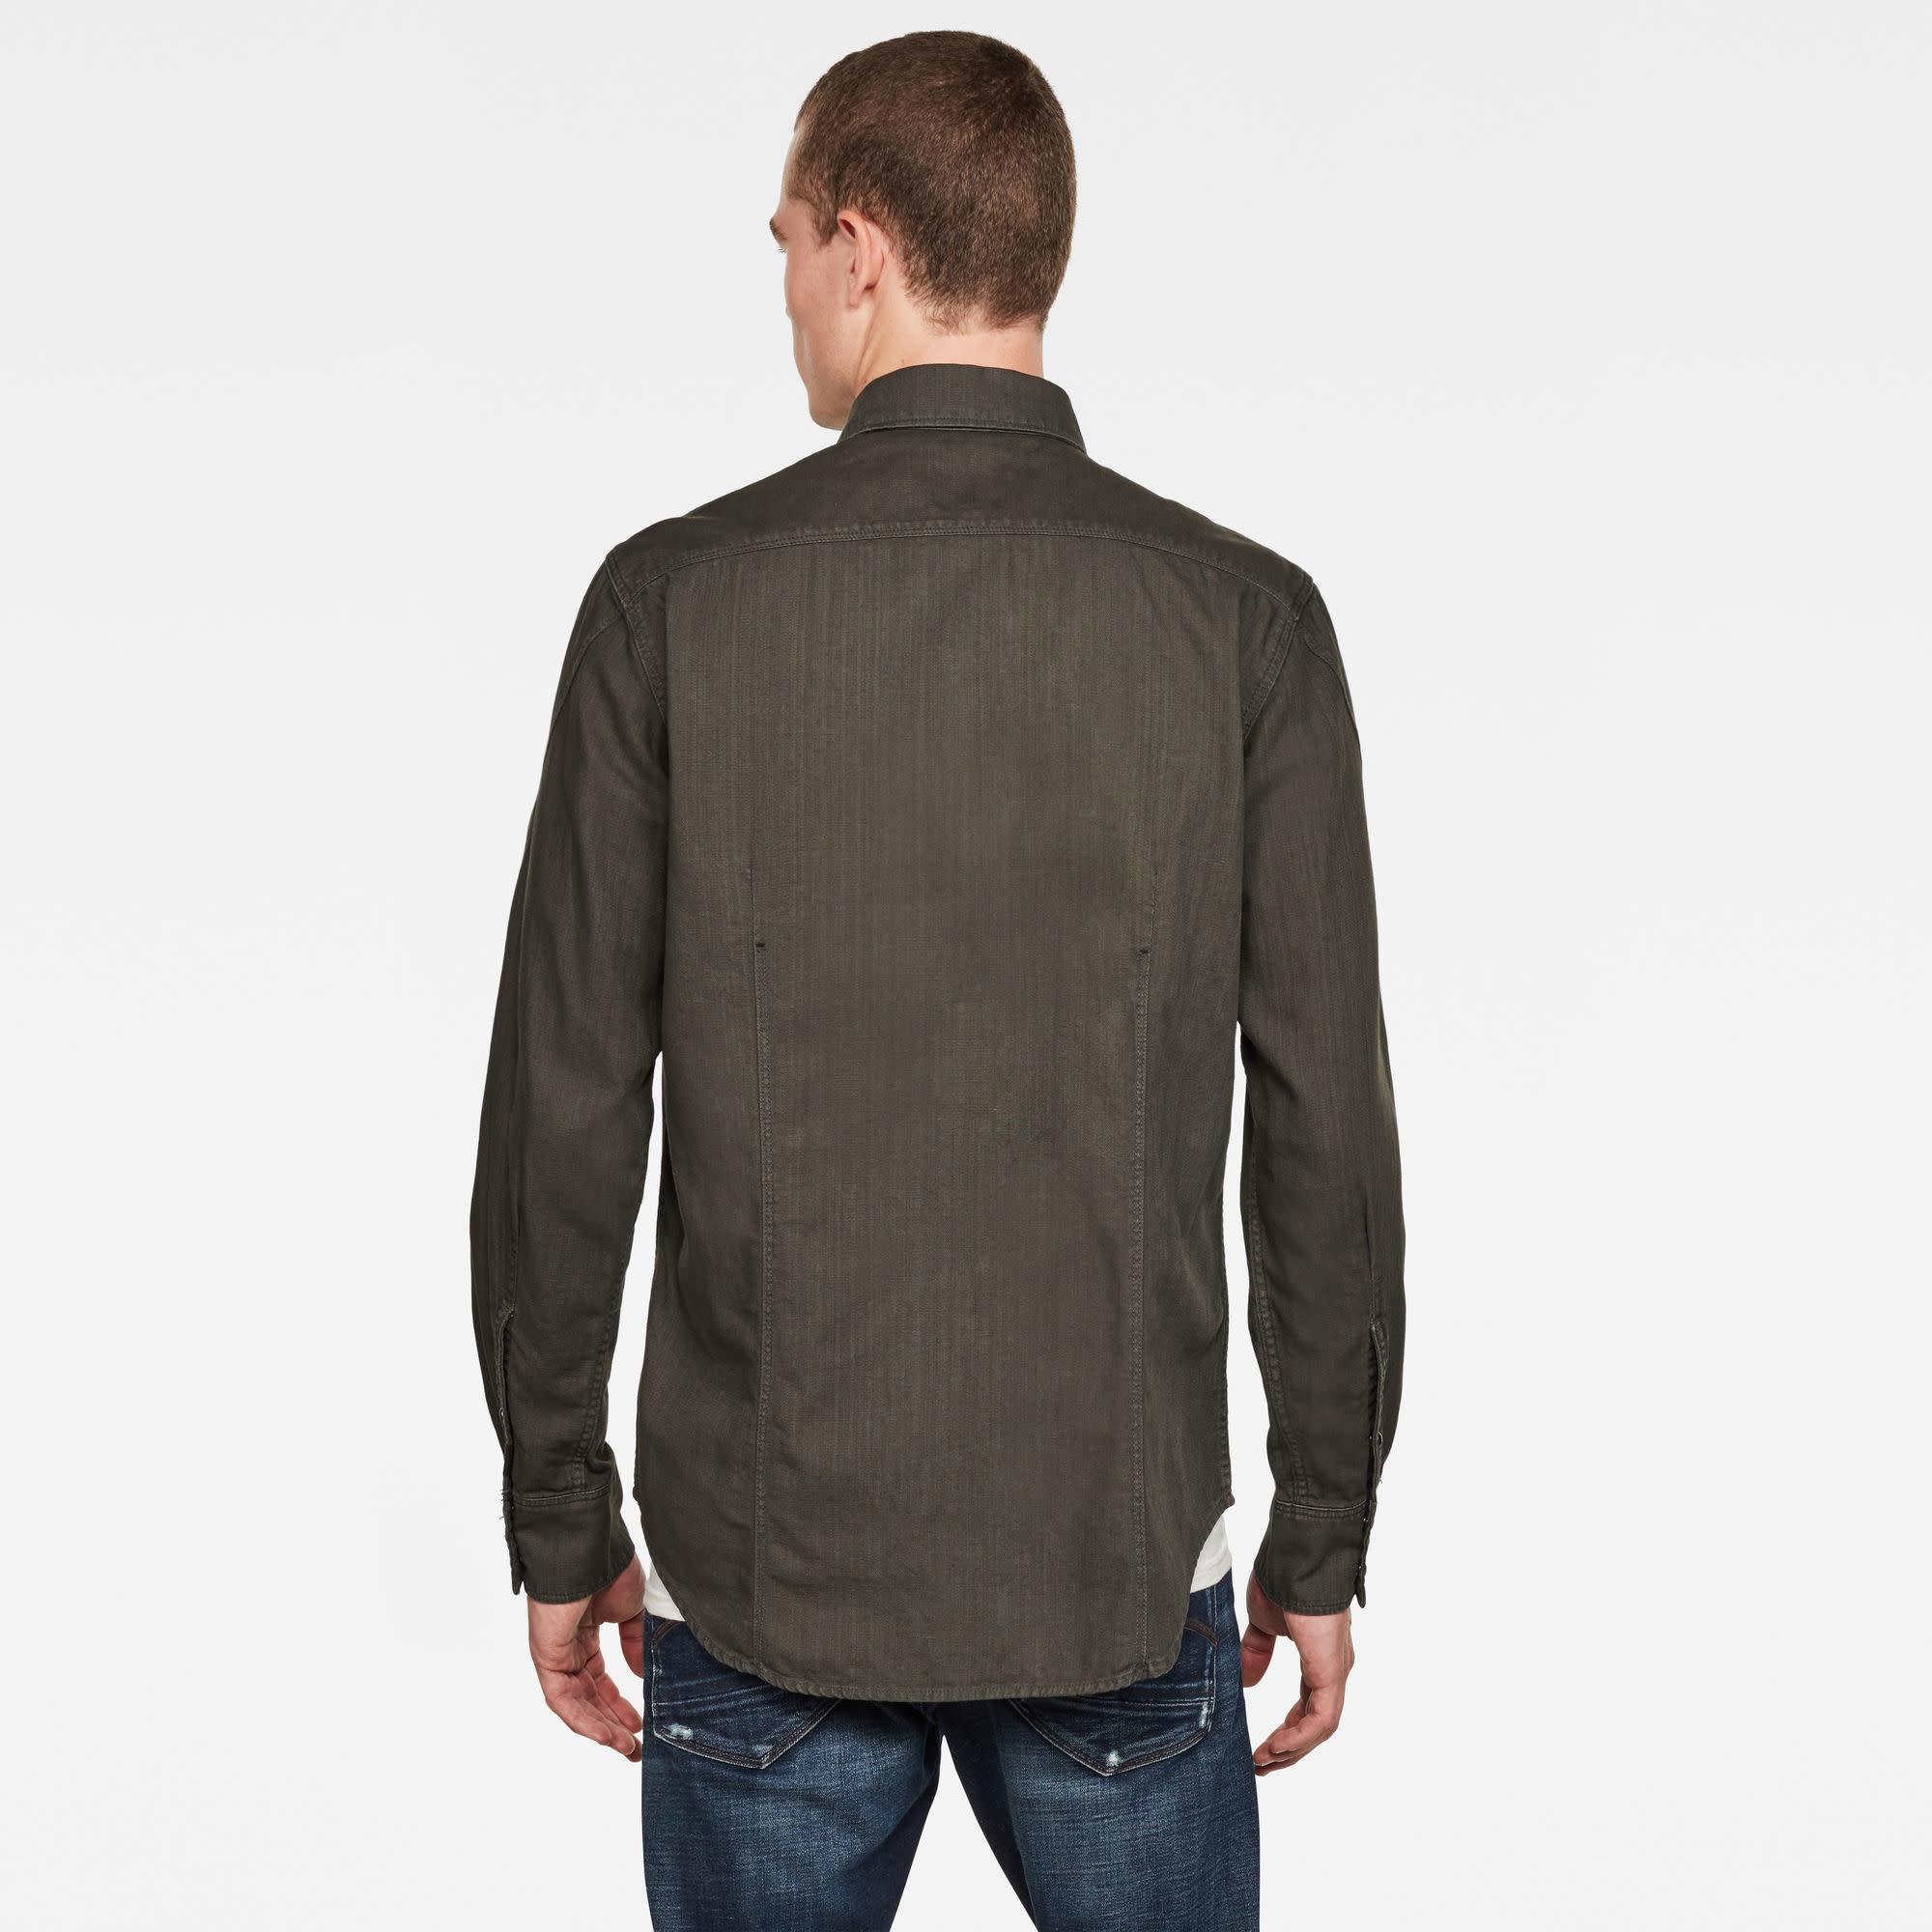 G-Star G-Star Arc 3D Slim L/S Shirt 7647-B575 Asfalt Green